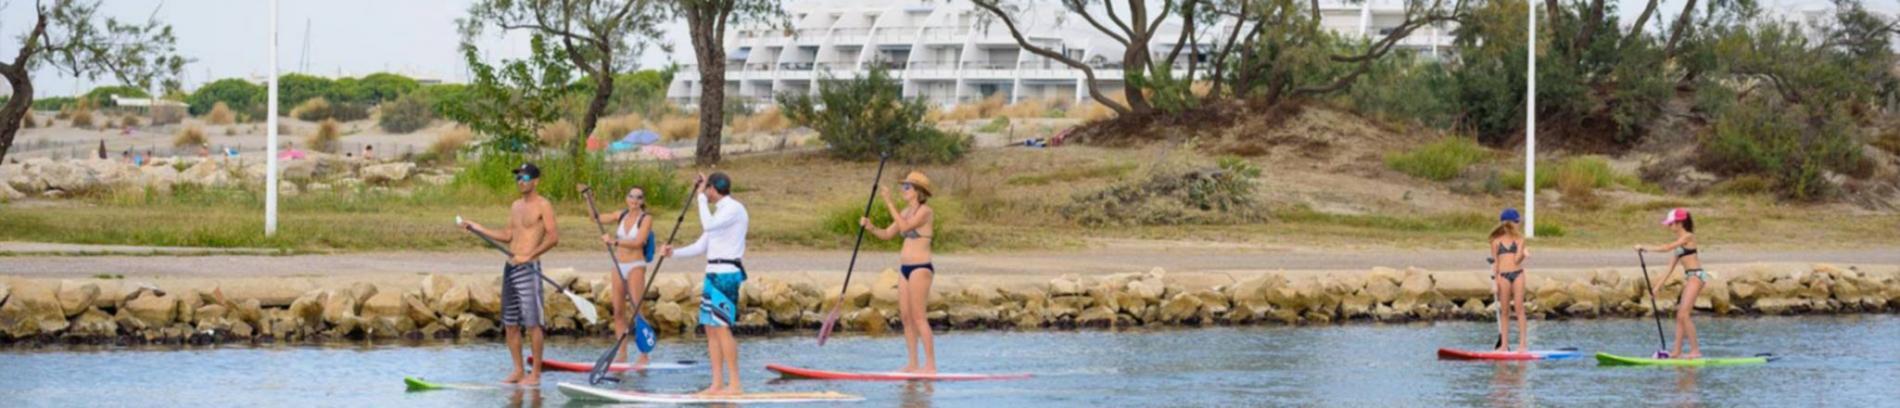 Slide paddle